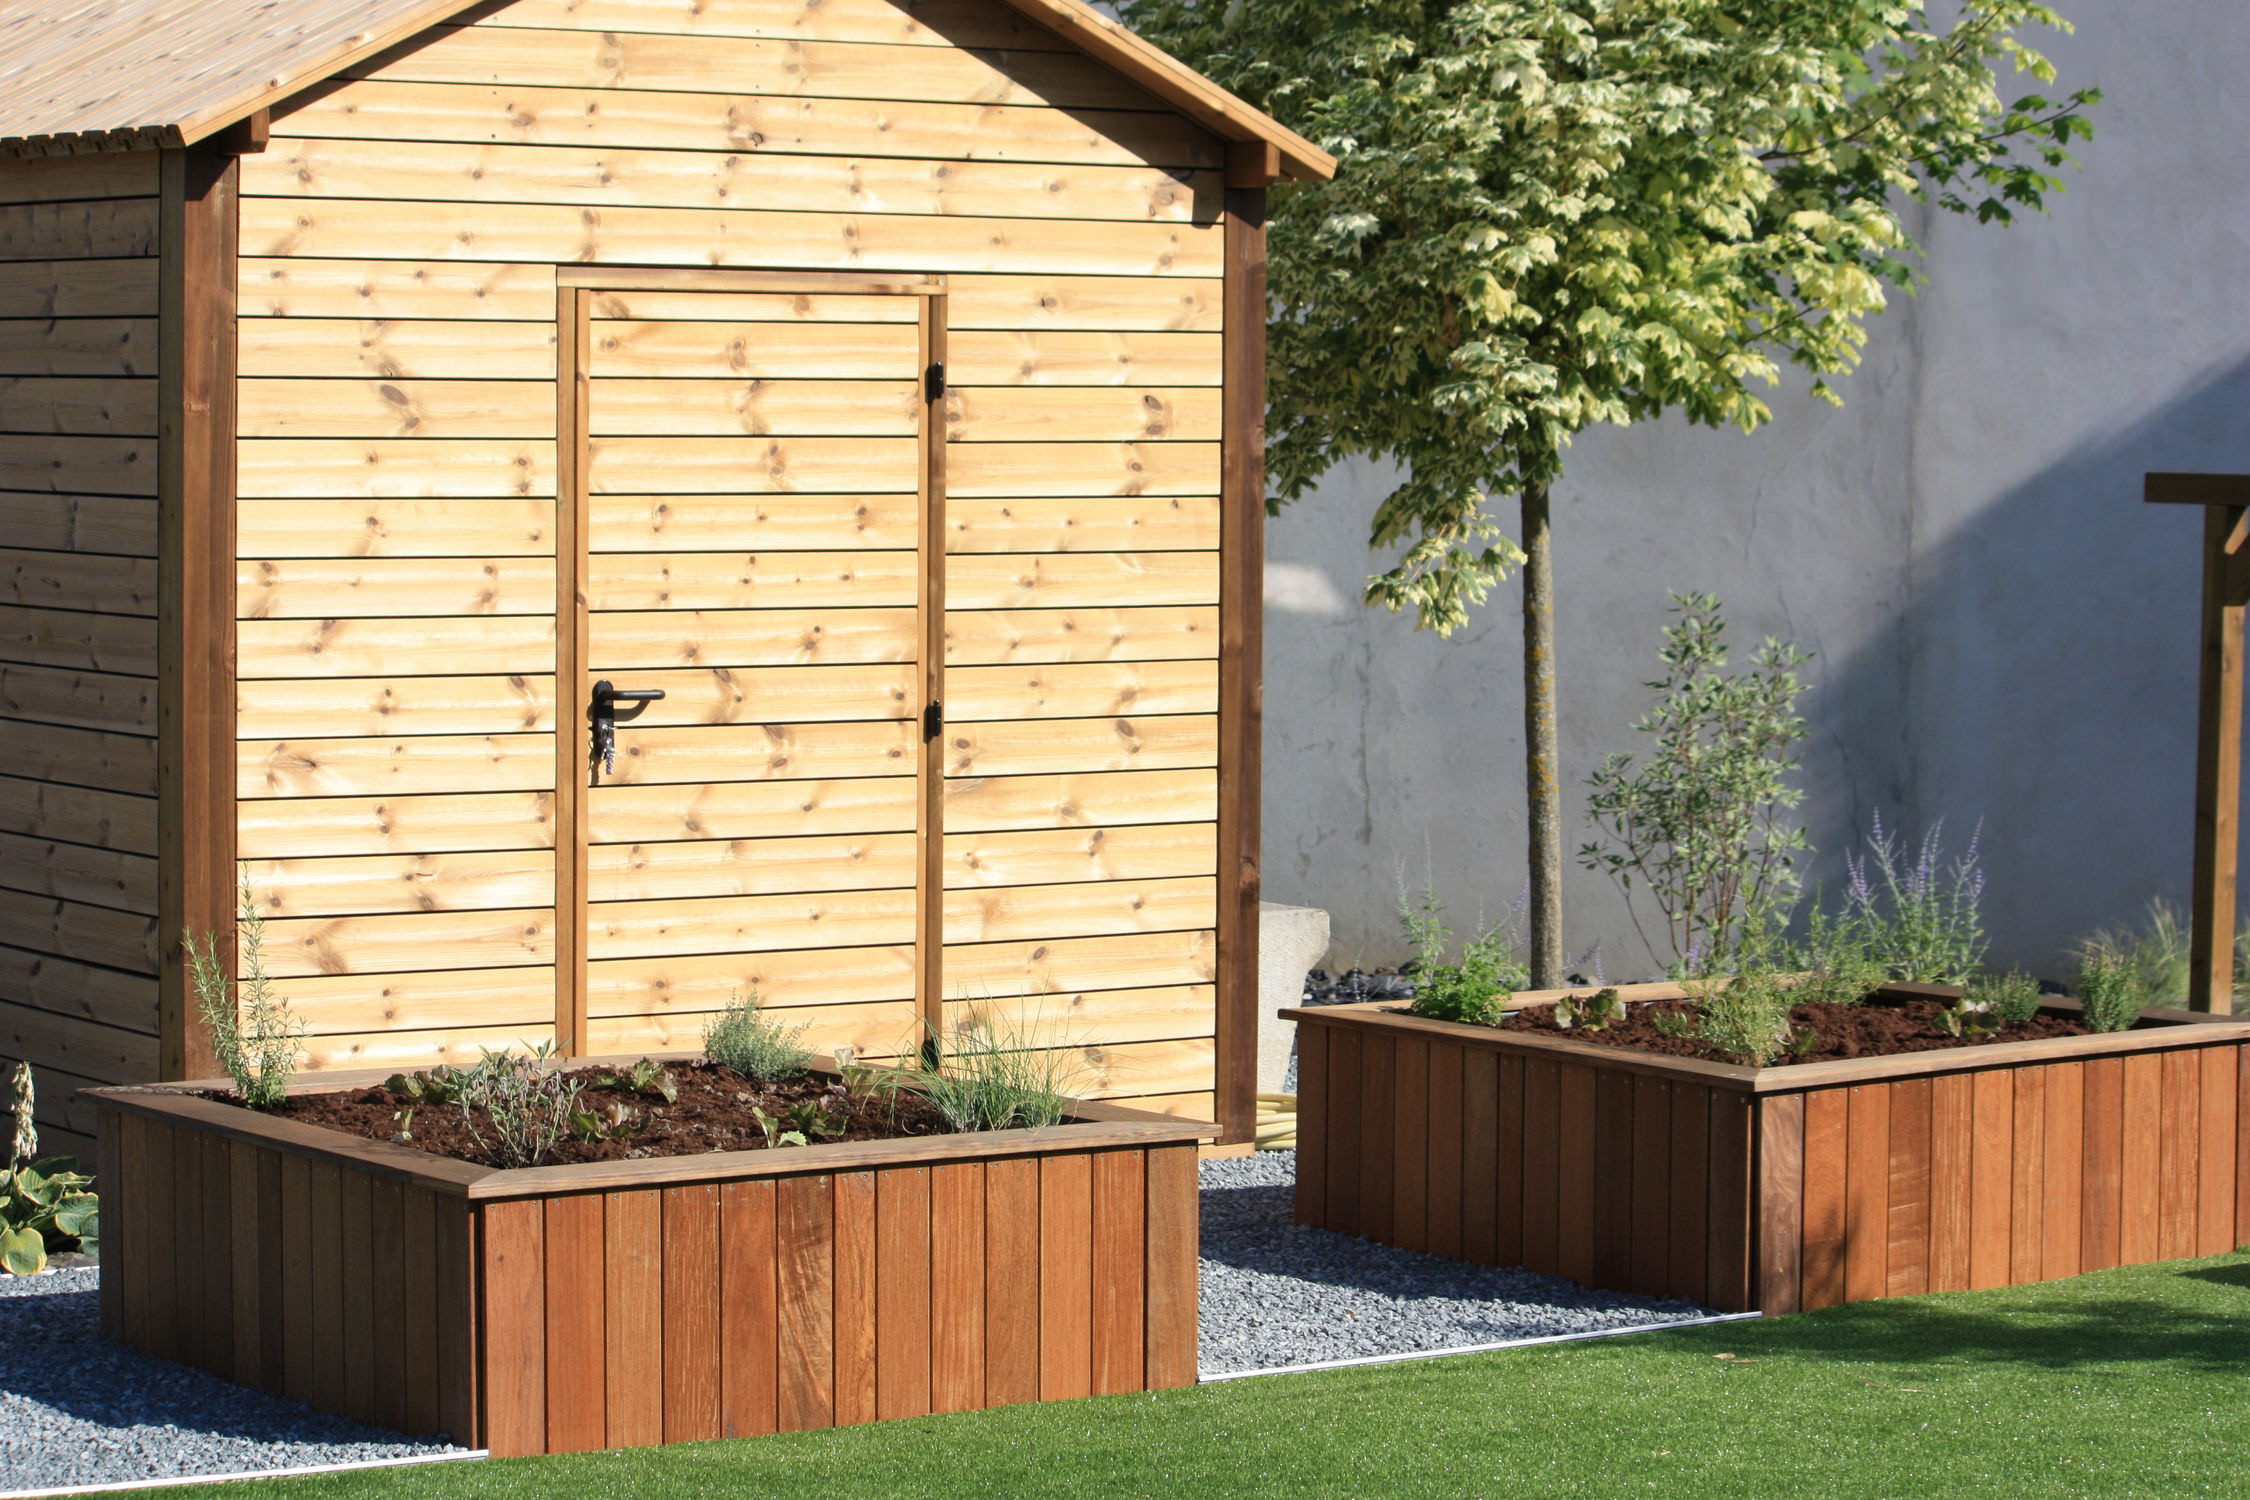 Holz-Gartenhaus - ABRIS DE JARDIN - Groupe grad